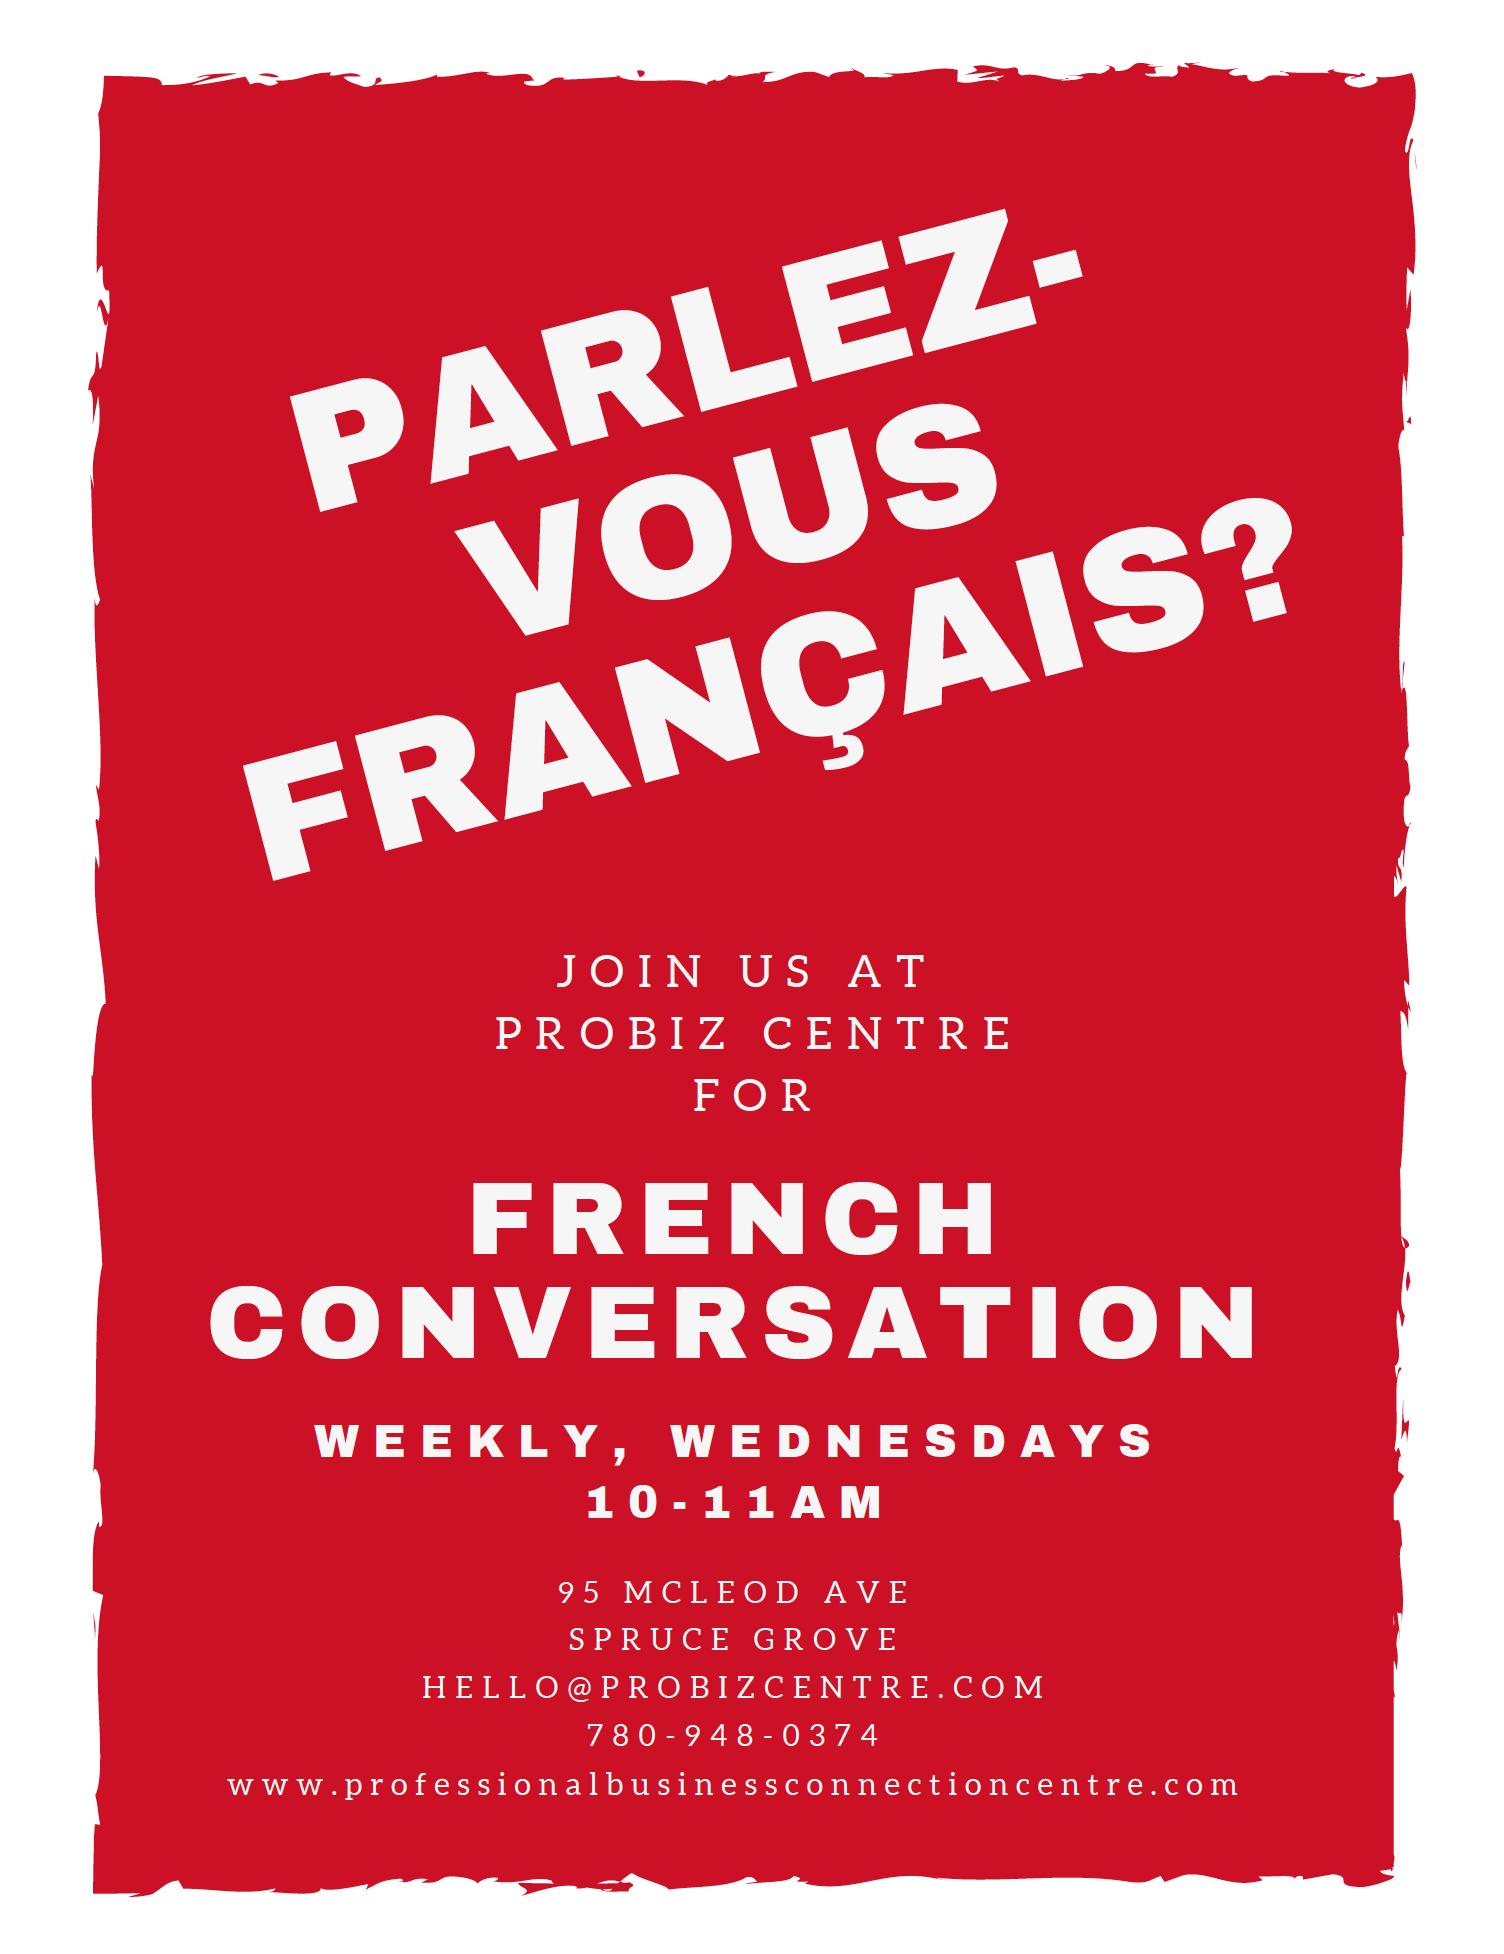 FrenchConversation-SEP-DEC2019.png